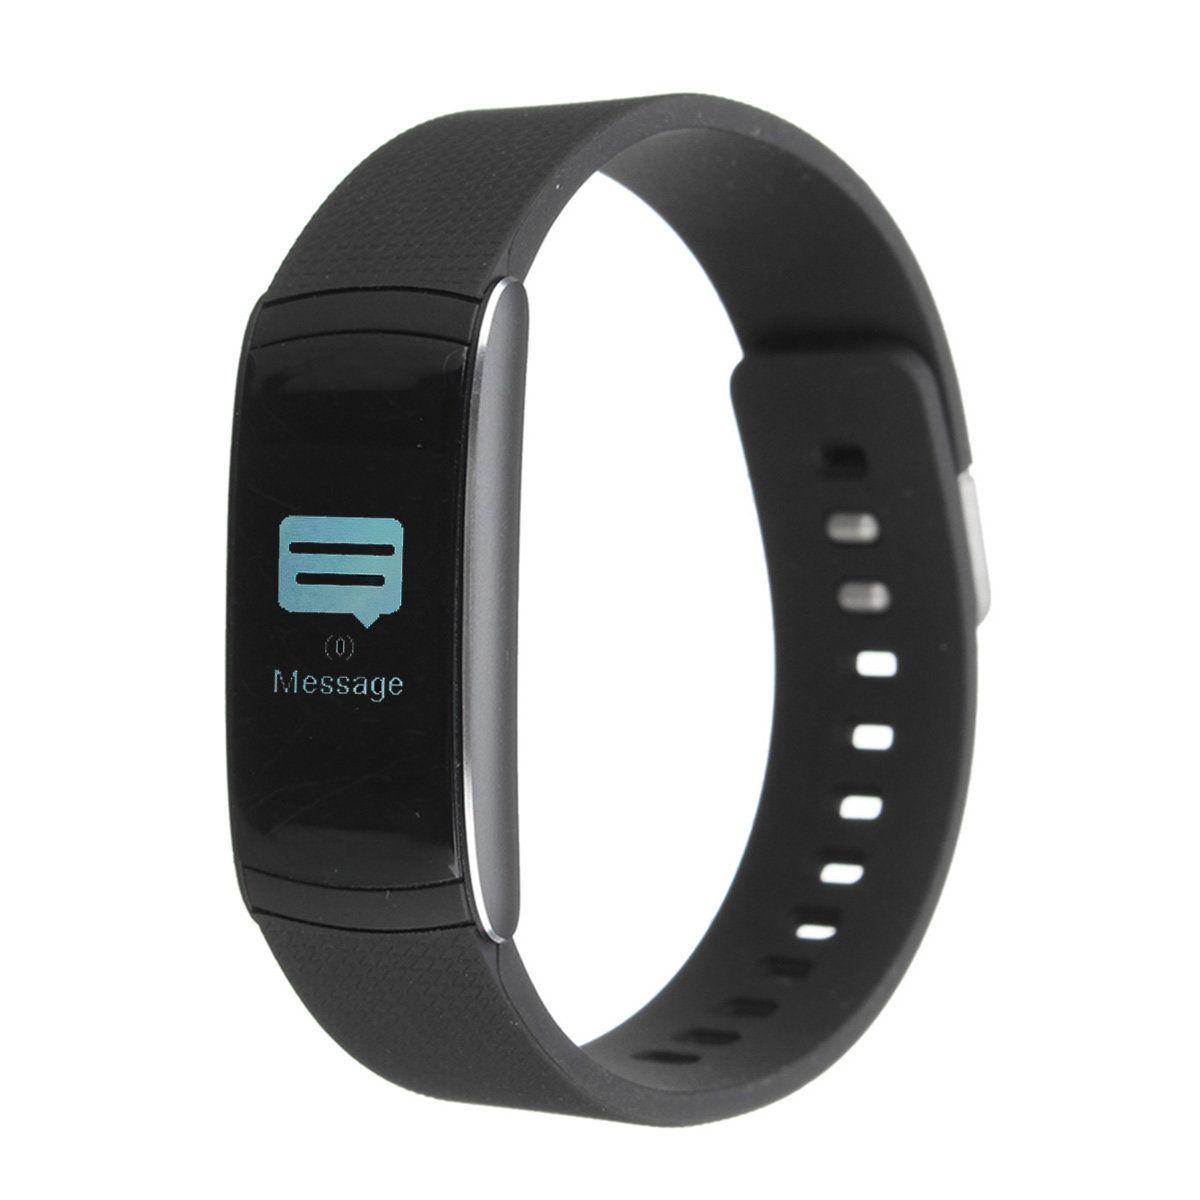 [US43.27] Bluetooth 4.0 I6PRO Smart Heart Rate Sports